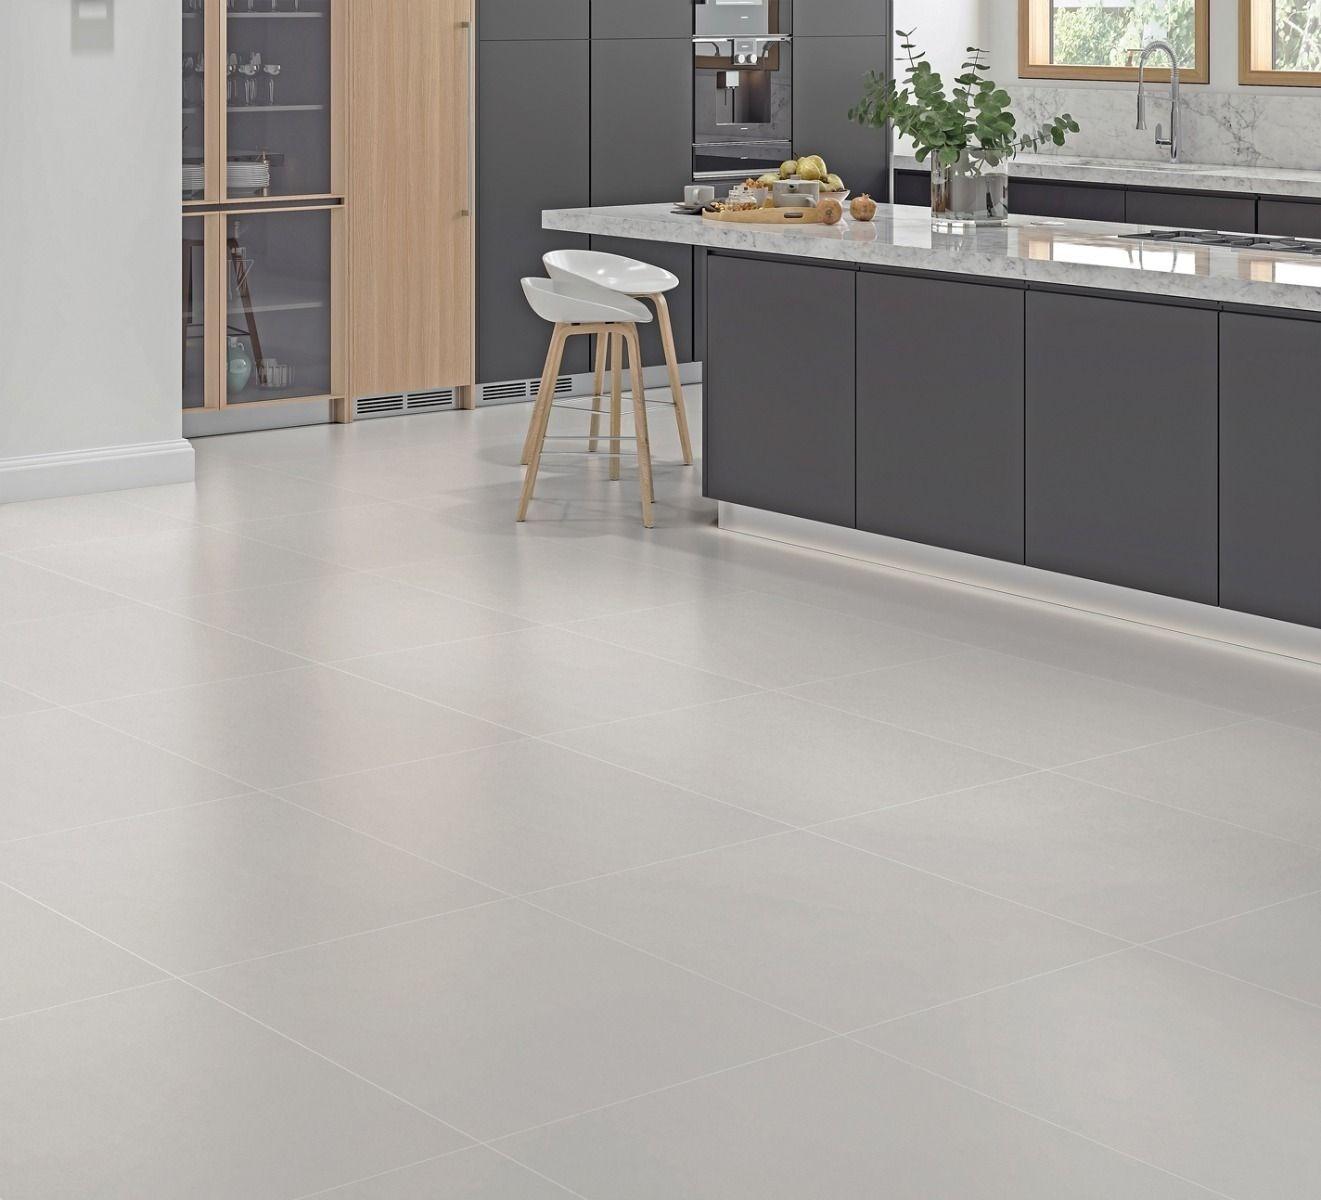 Oslo Grey Matt 600 X 600mm Porcelain Floor Tile Luxury Tiles